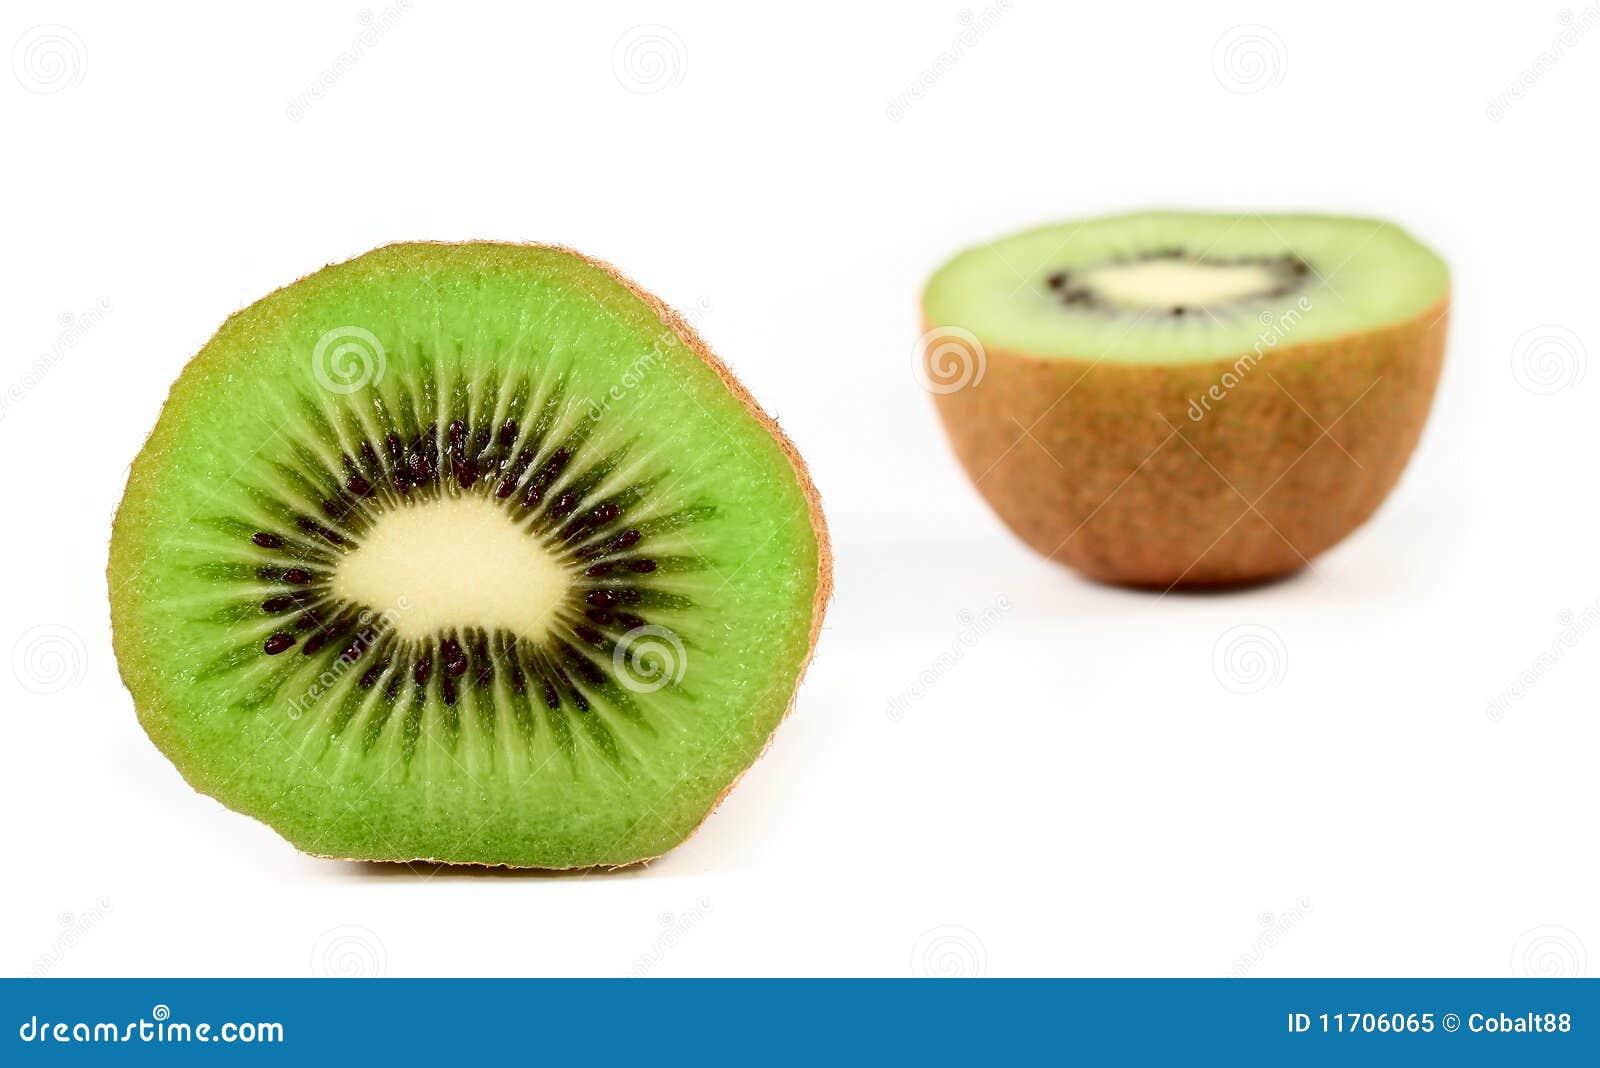 Kiwi Fruit Cut In Half Royalty Free Stock Photo - Image: 11706065